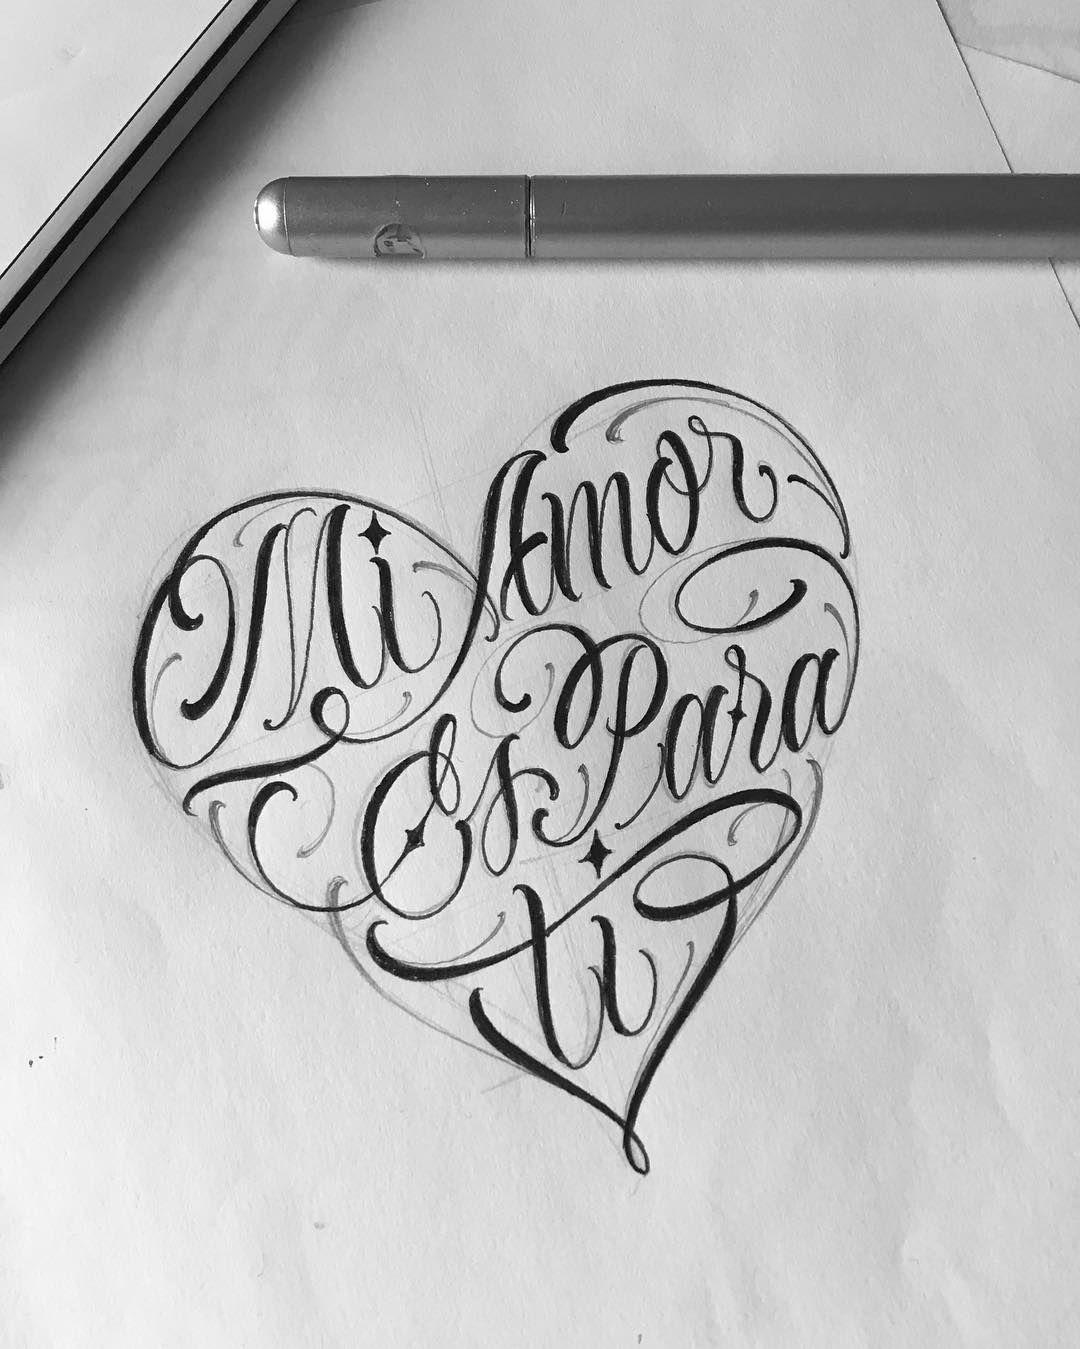 Pin by andrew wright on tatts and drawings tätowierungen tattoo vorlagen typografie